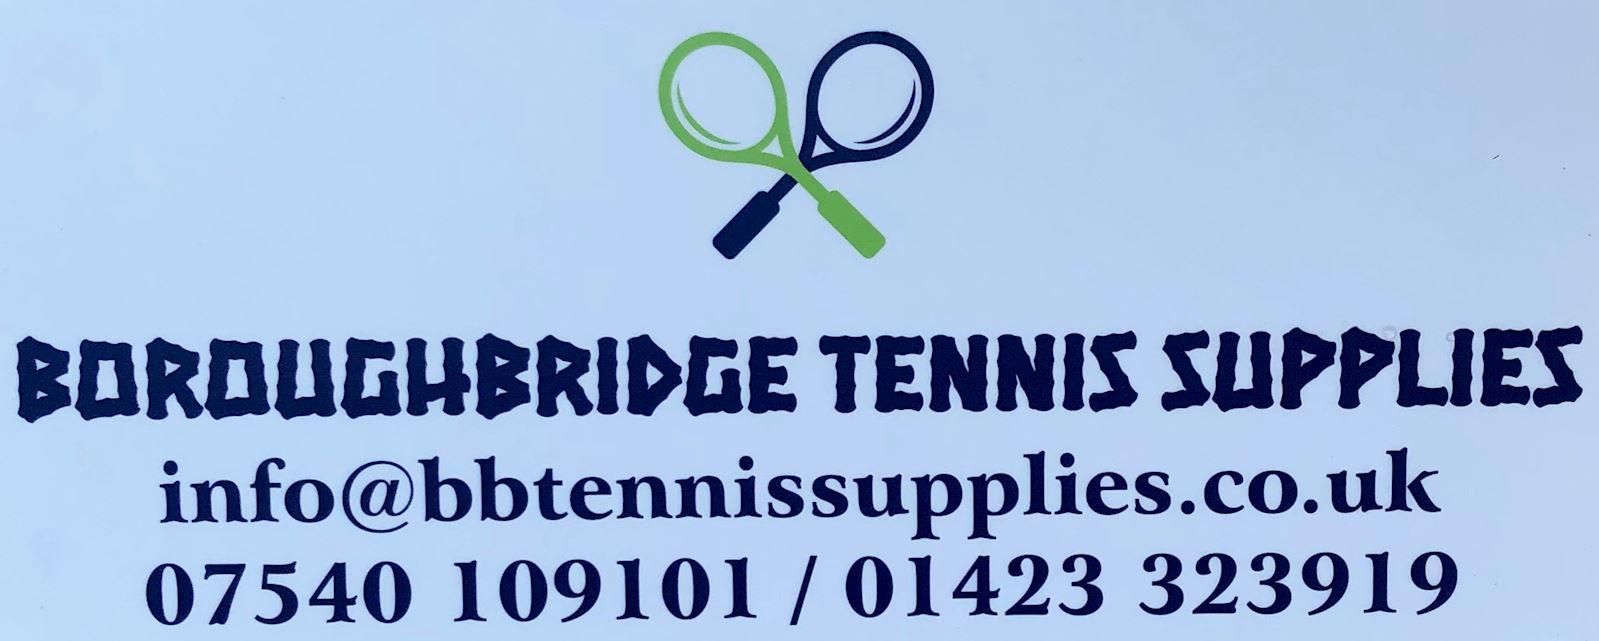 Boroughbridge Tennis Supplies